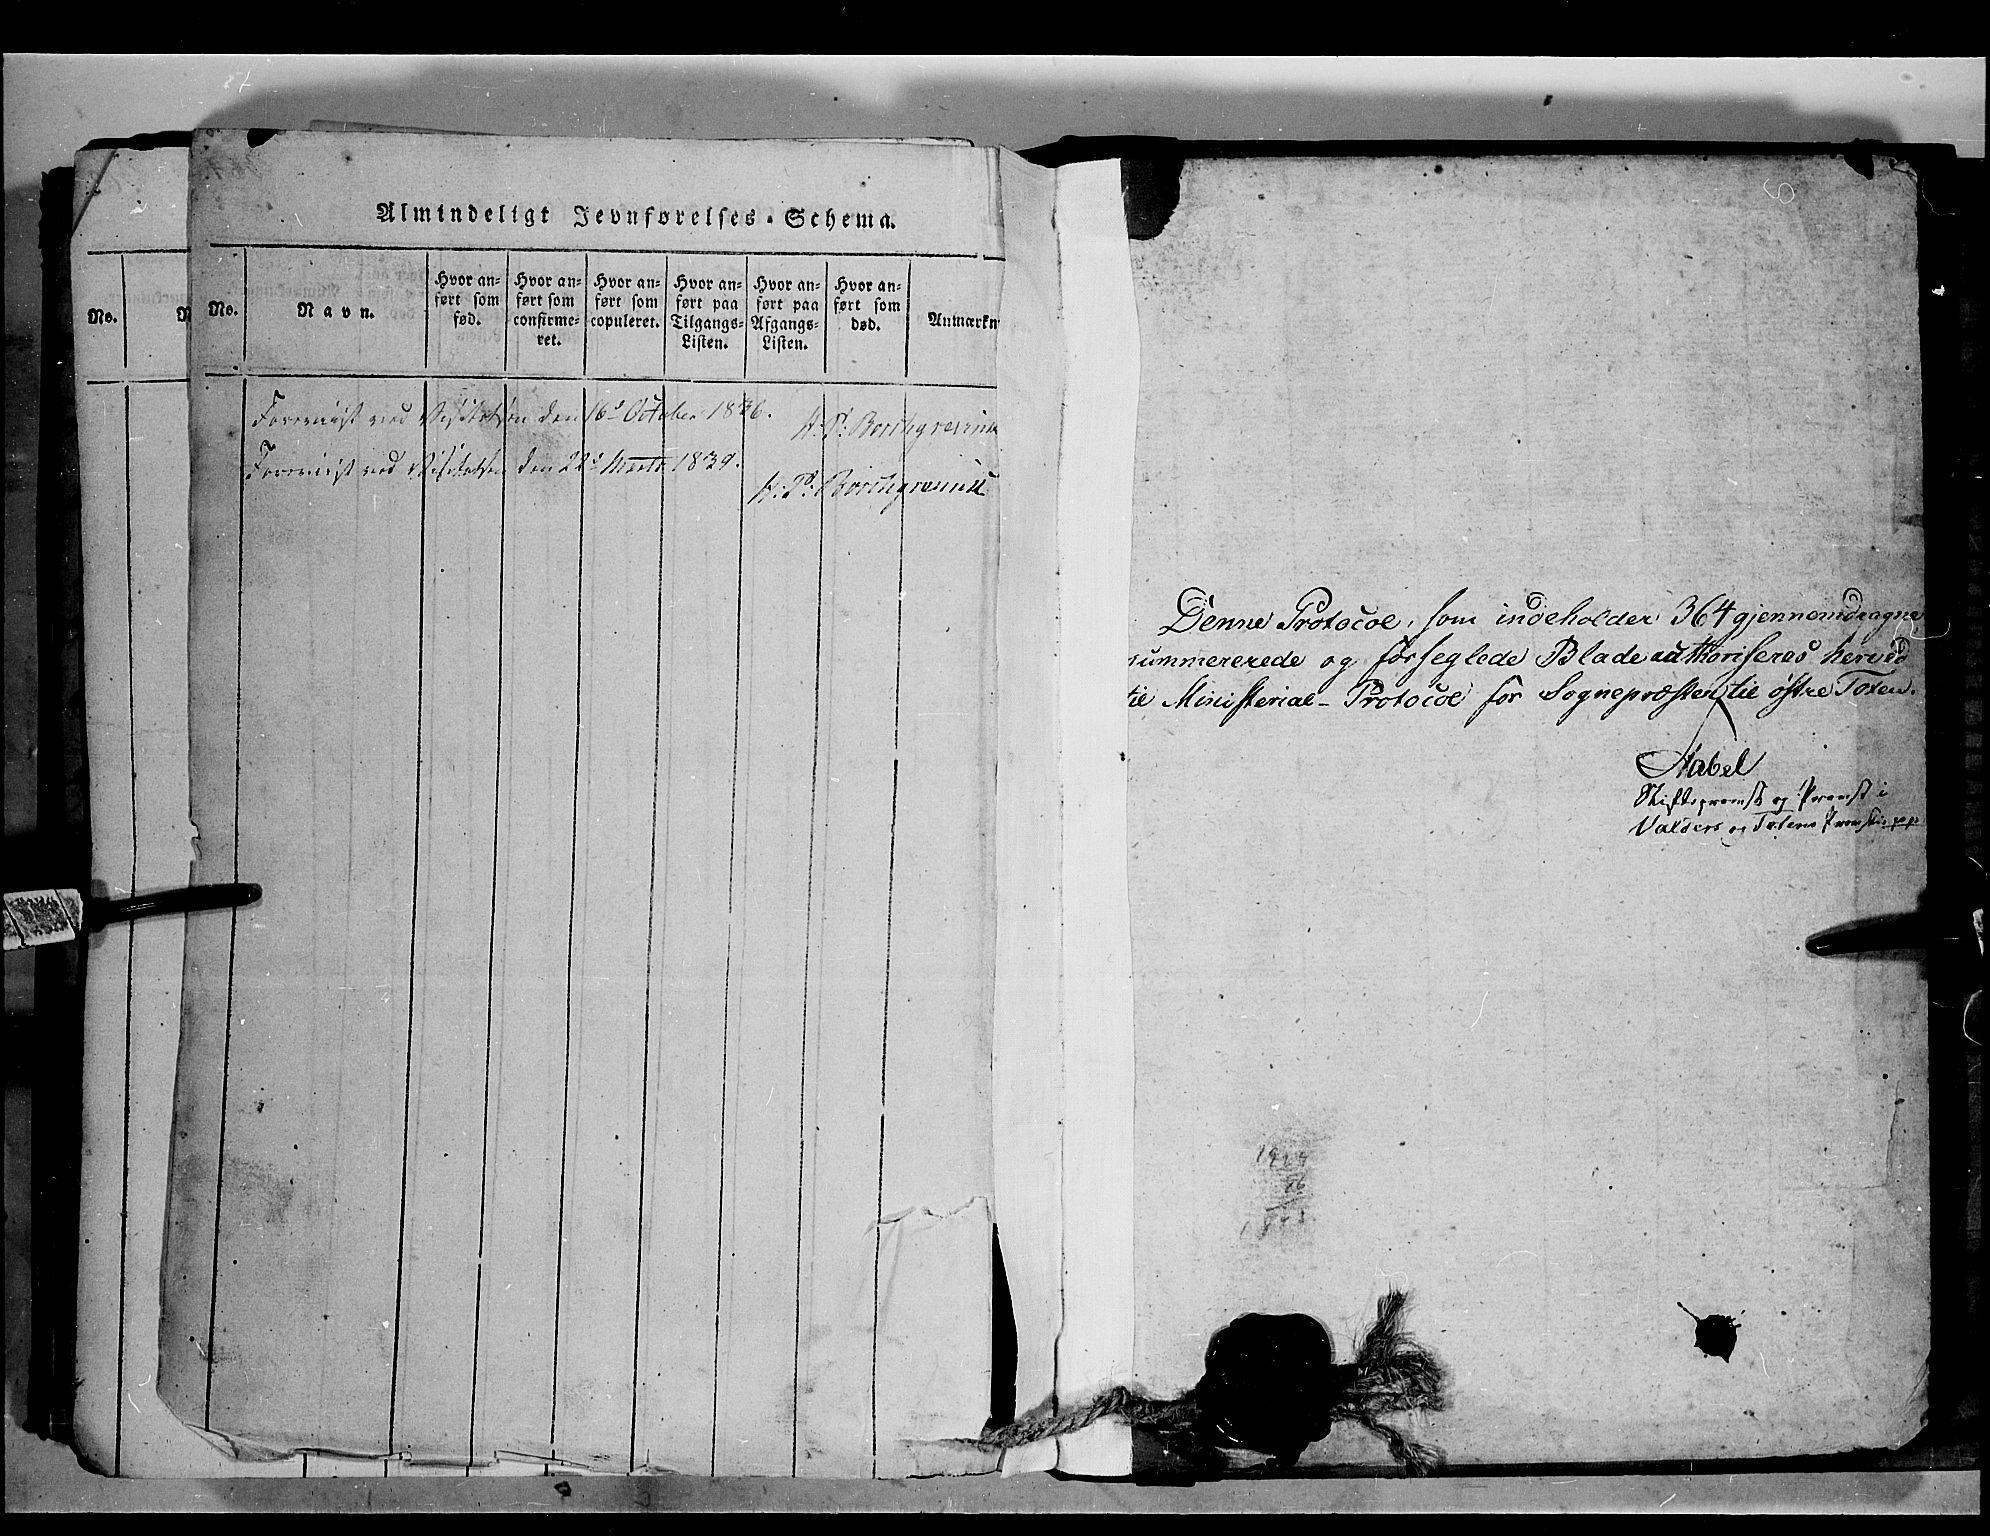 SAH, Østre Toten prestekontor, Ministerialbok nr. 1, 1828-1839